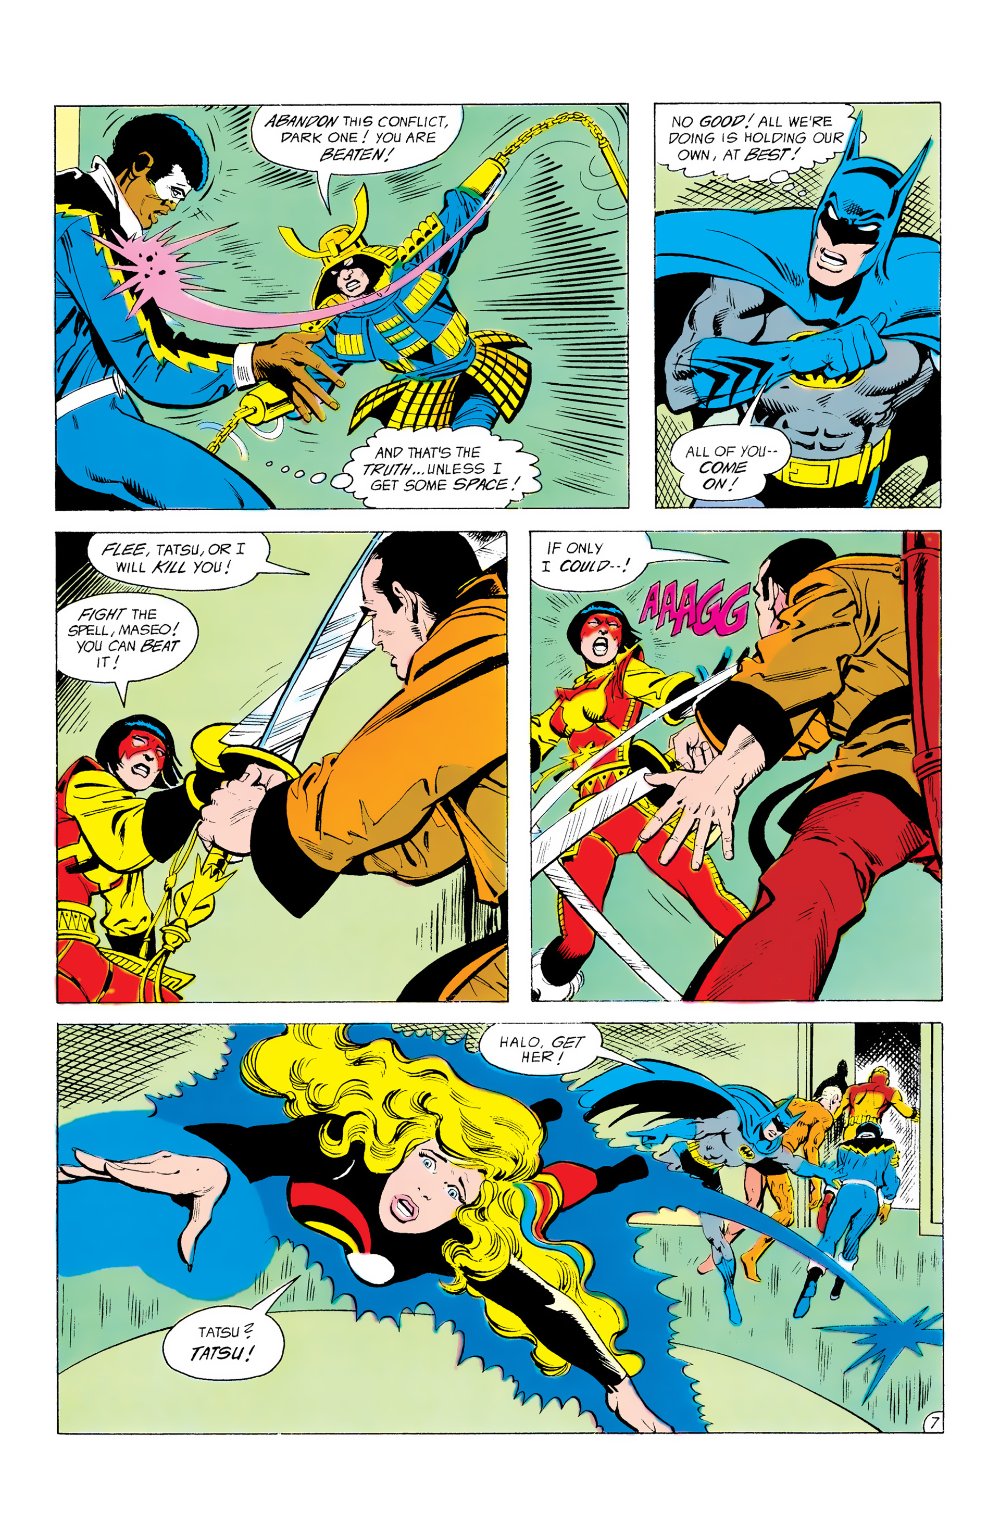 Batman And The Outsiders 1983 Issue 12 Read Batman And The Outsiders 1983 Issue 12 Comic Online In High Quality Heavy Metal Comic Comics Star Comics